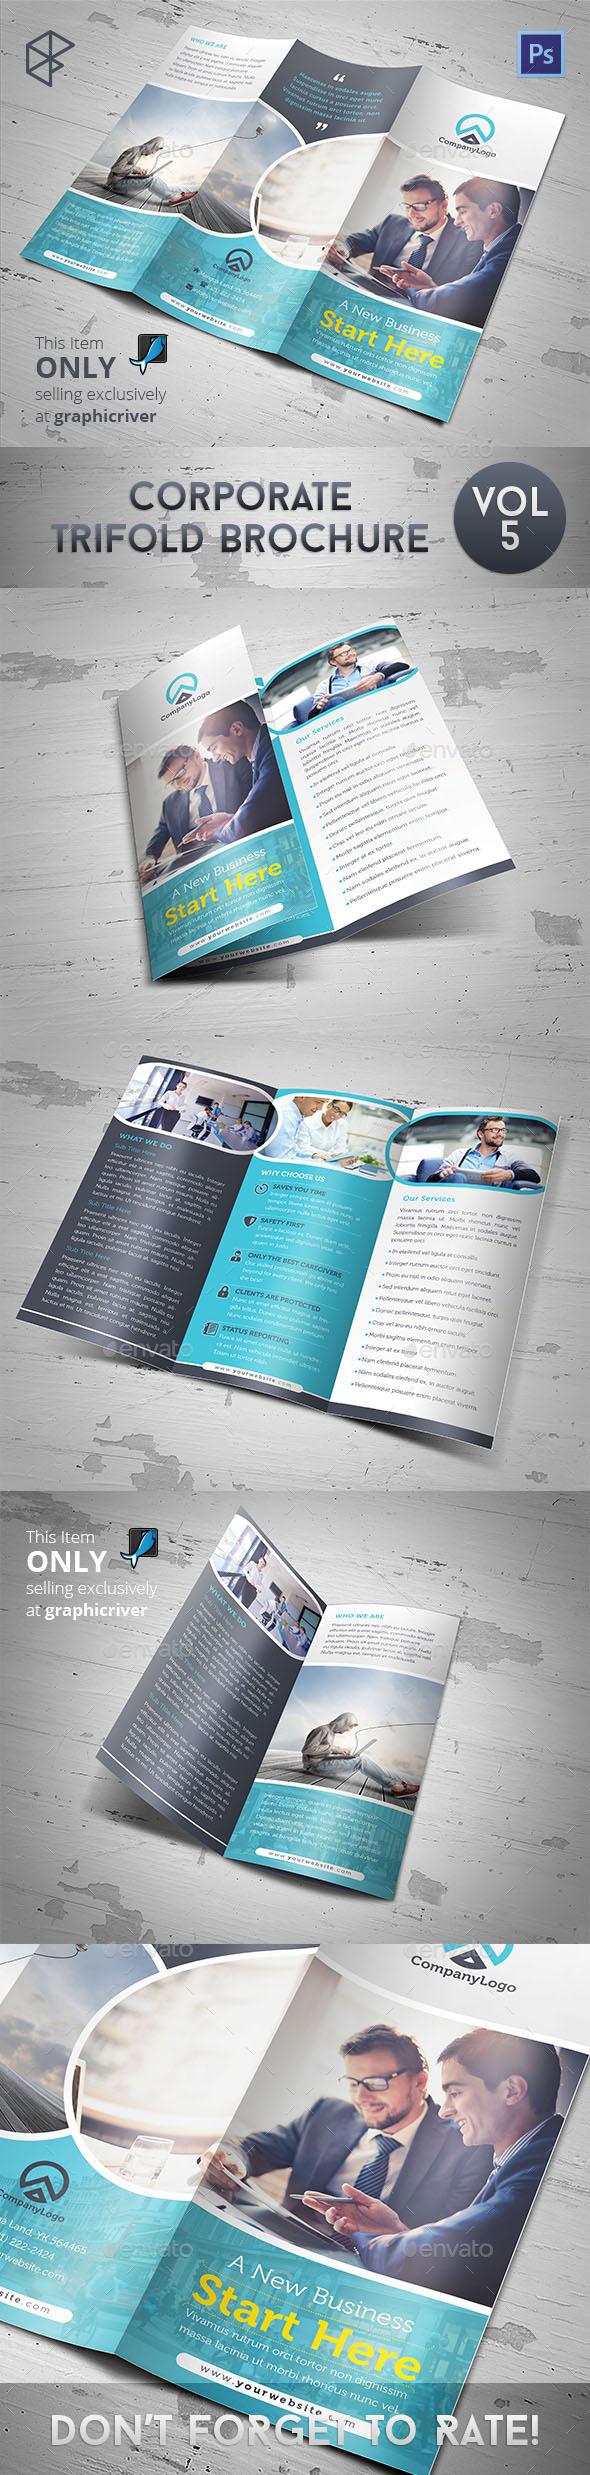 Corporate Trifold Brochure Vol 5 - Corporate Brochures